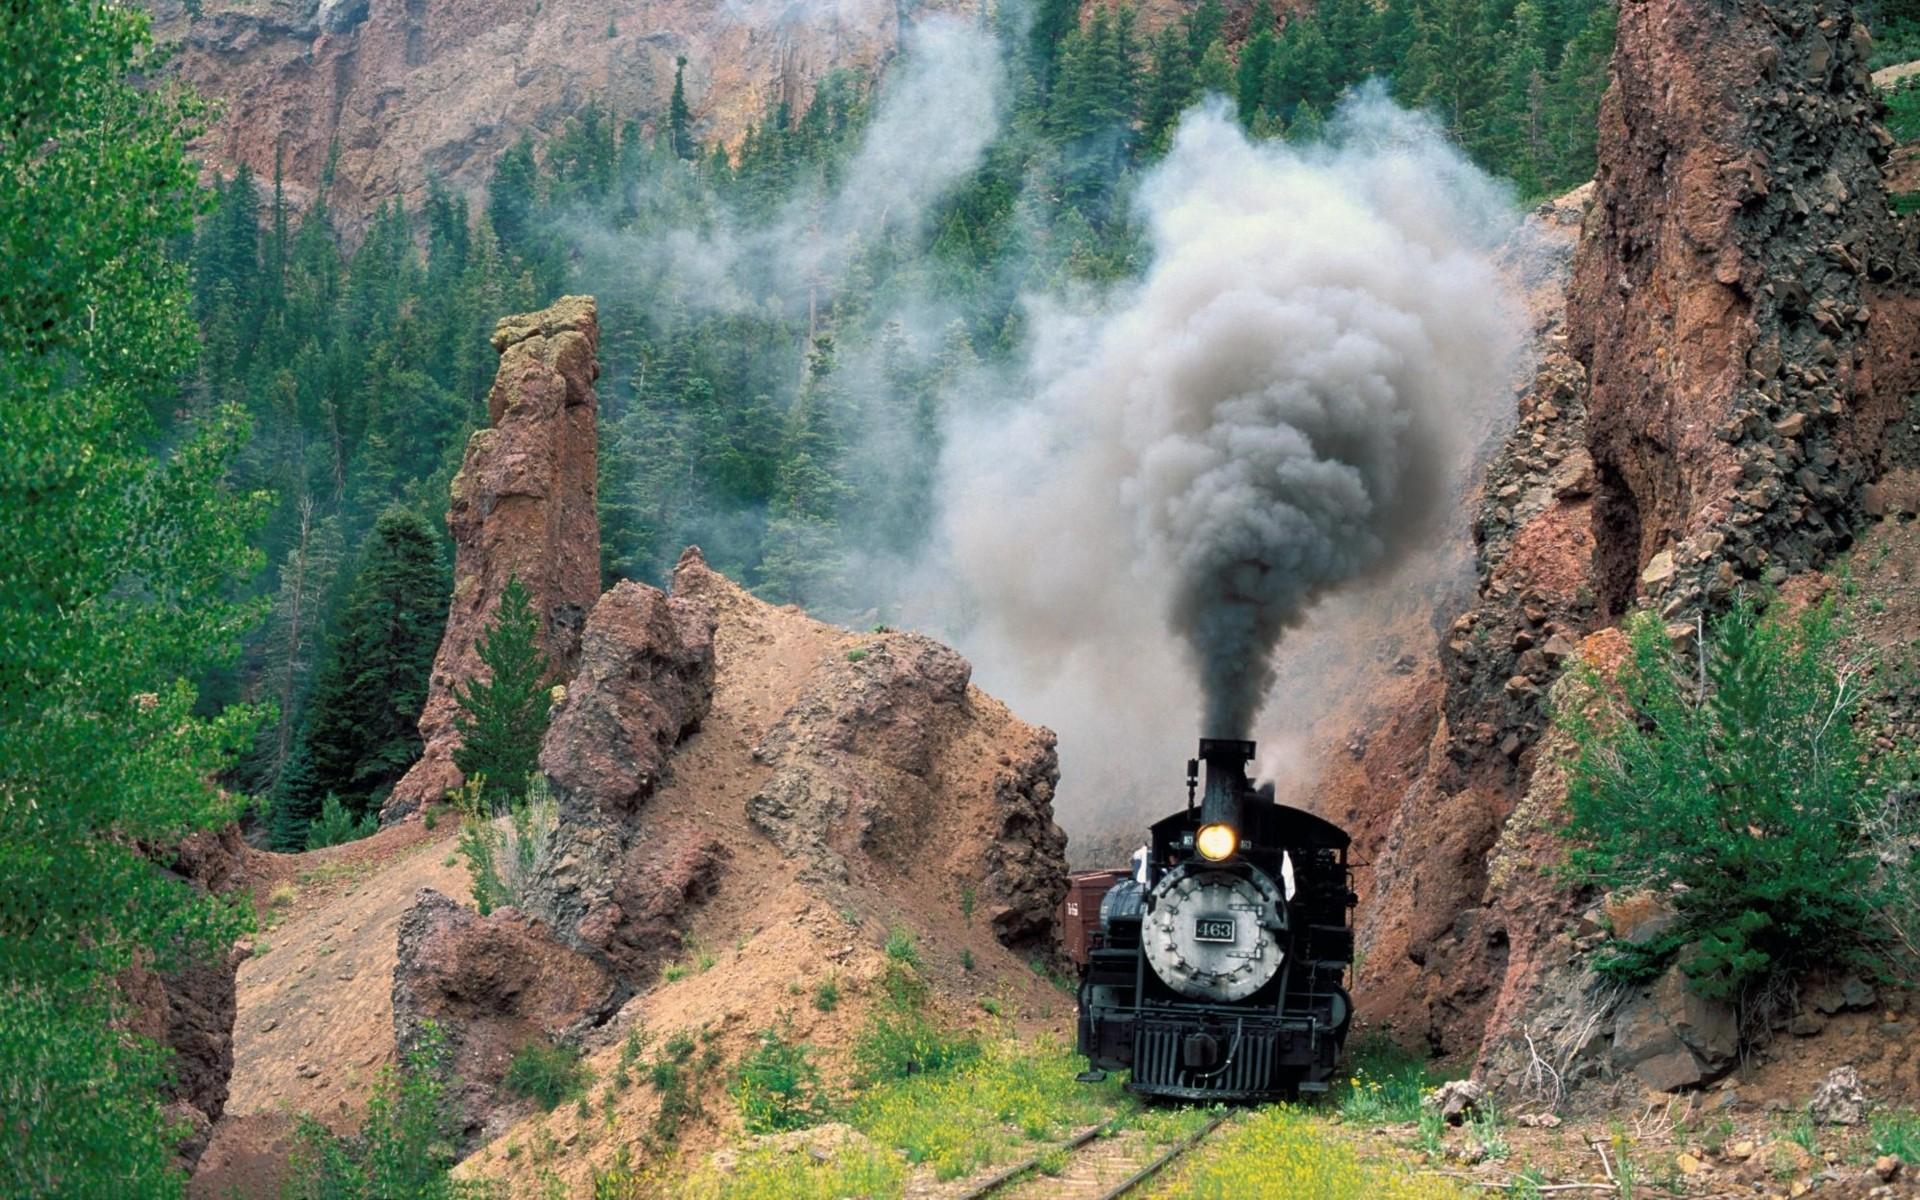 nature-railroad-tracks-smoke-steam-910751-1920x1200